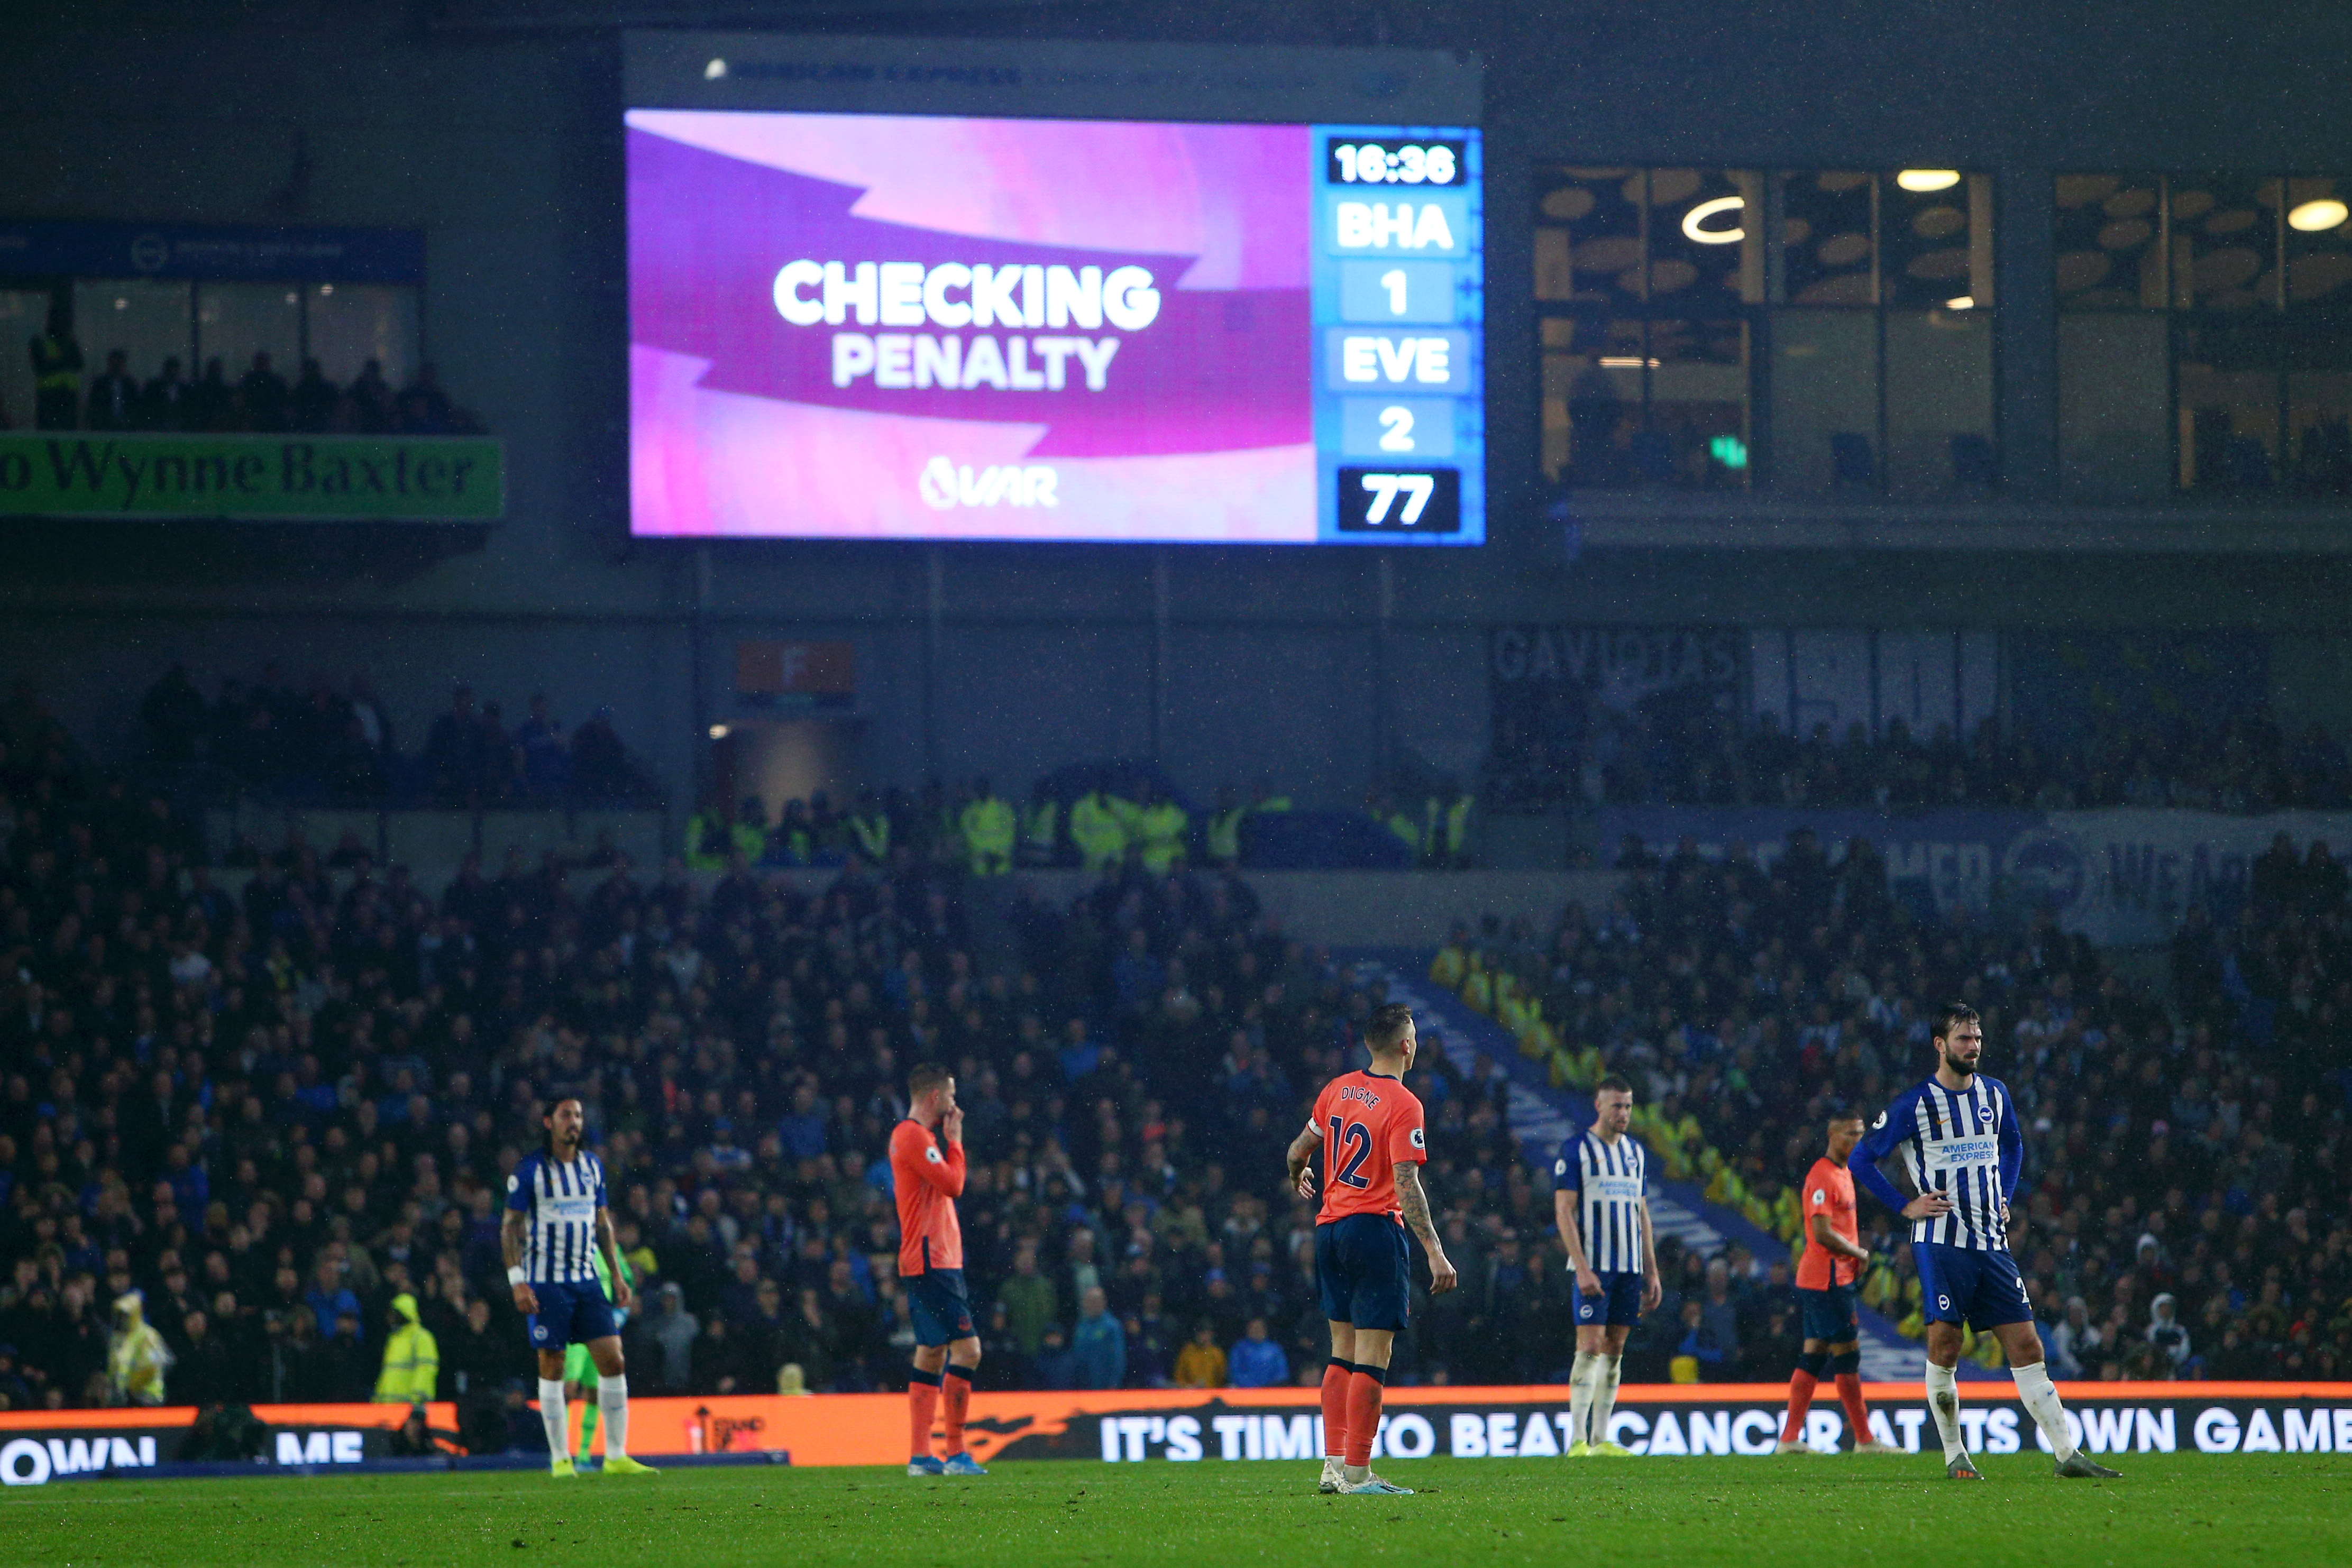 Everton write to Premier League to express VAR concern